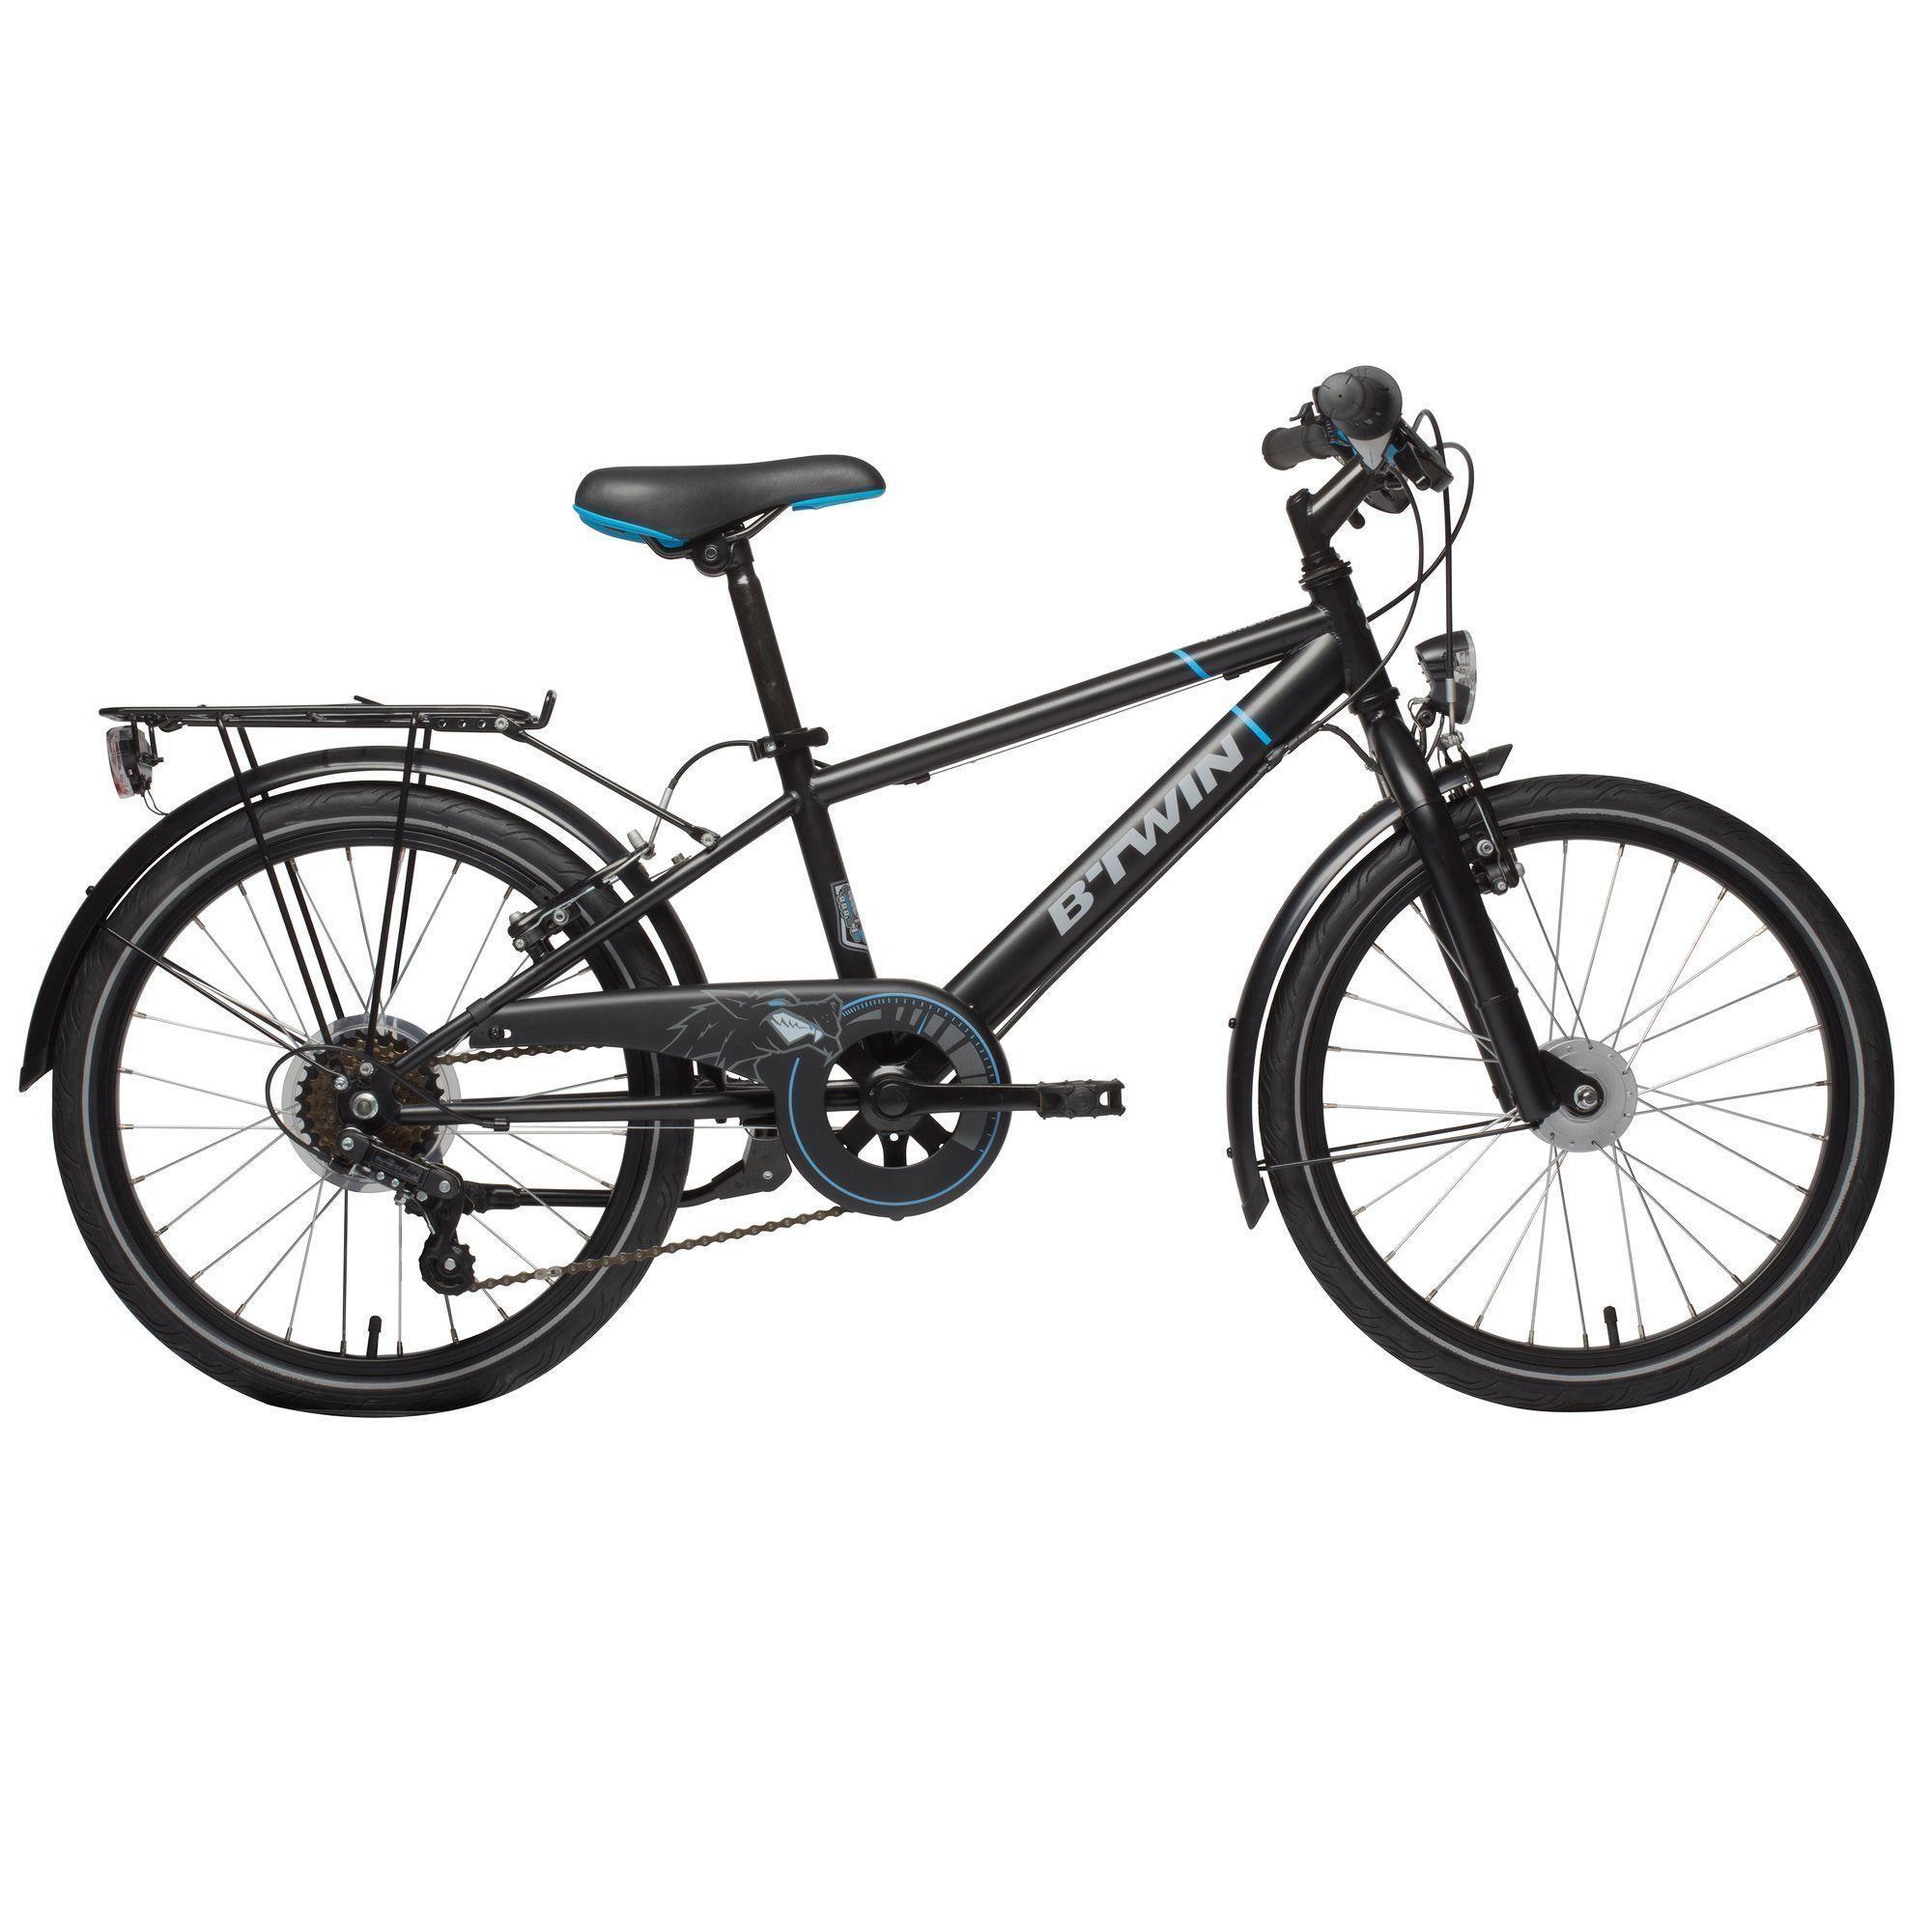 Pin Auf E Roller E Scooter E Bikes Roller Scooter Fahrrader